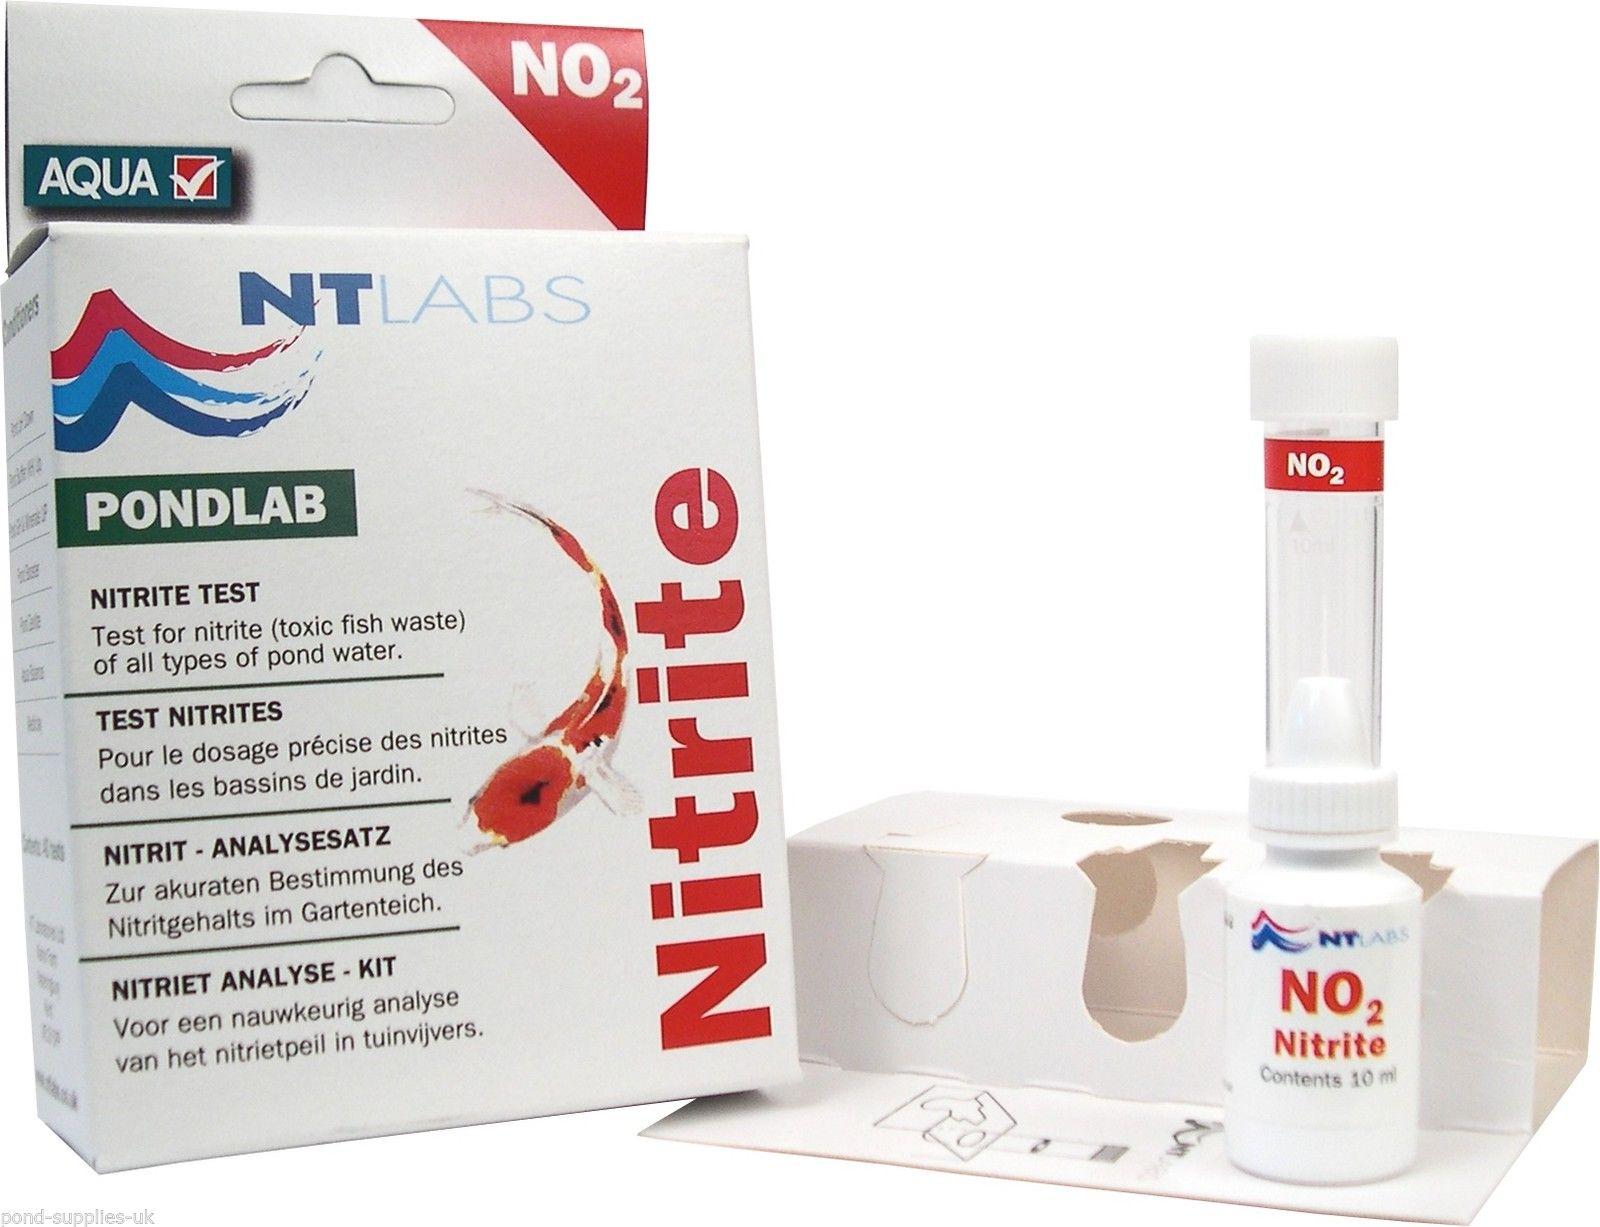 Nt labs single pond test kits ammonia nitrate ph nitrite for Ph for koi fish